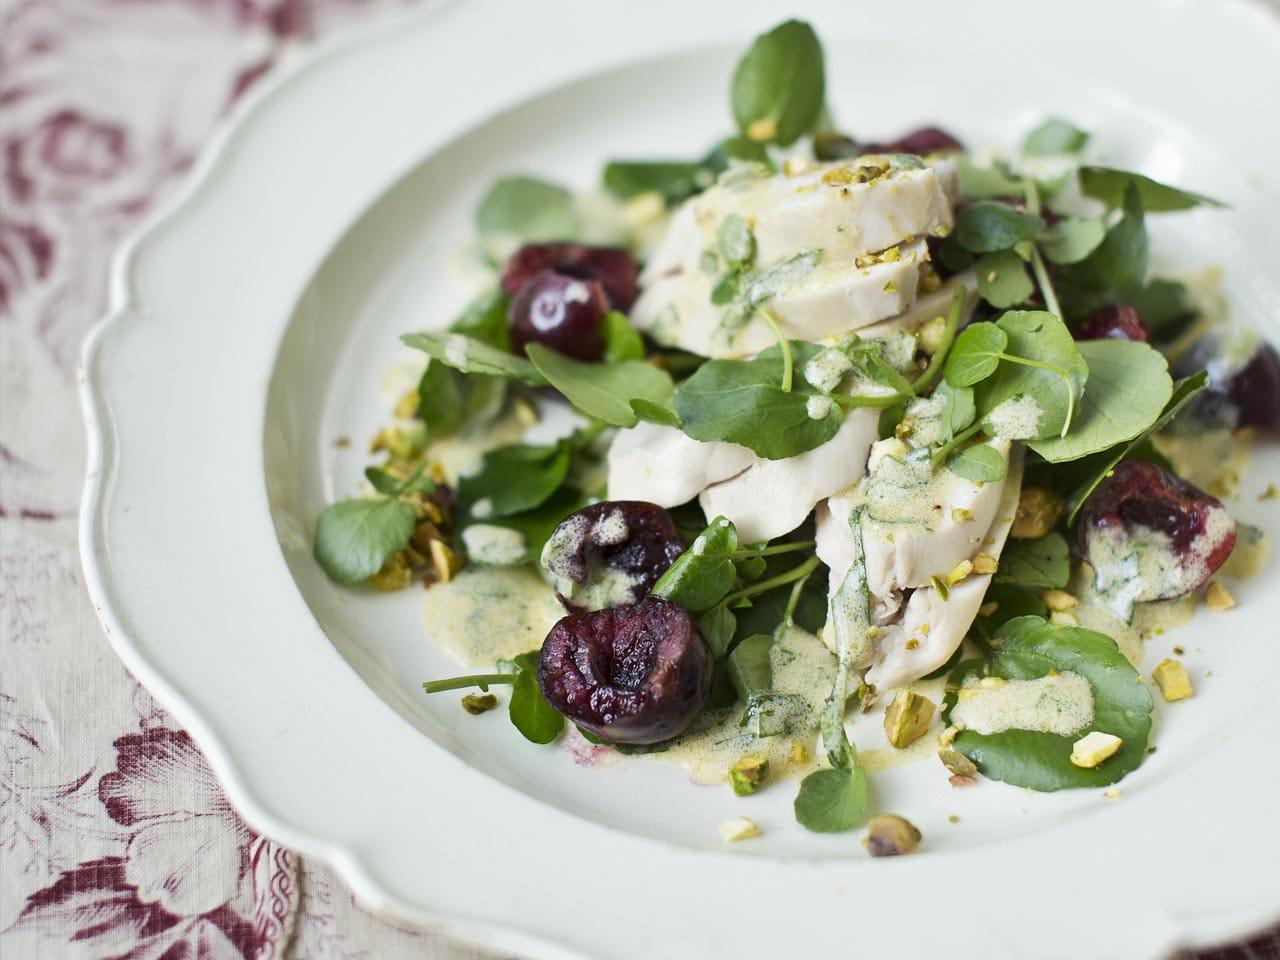 Chicken salad with creamy tarragon dressing